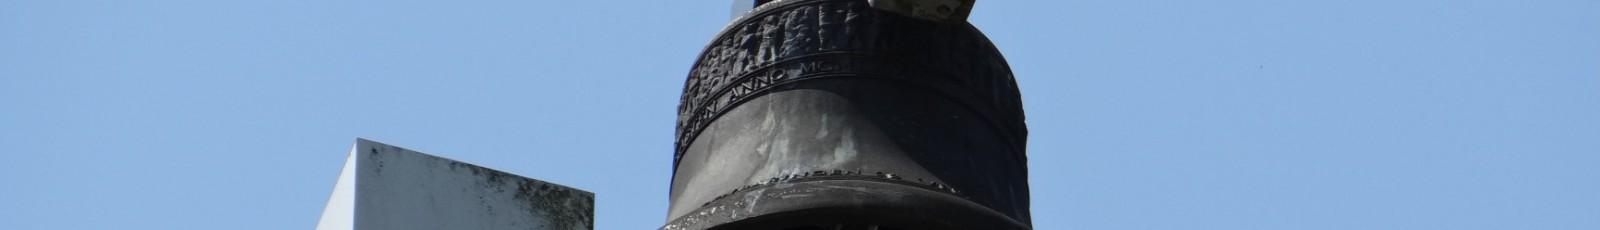 Christelijke Gereformeerde Kerk Bennekom – Oosterbeek